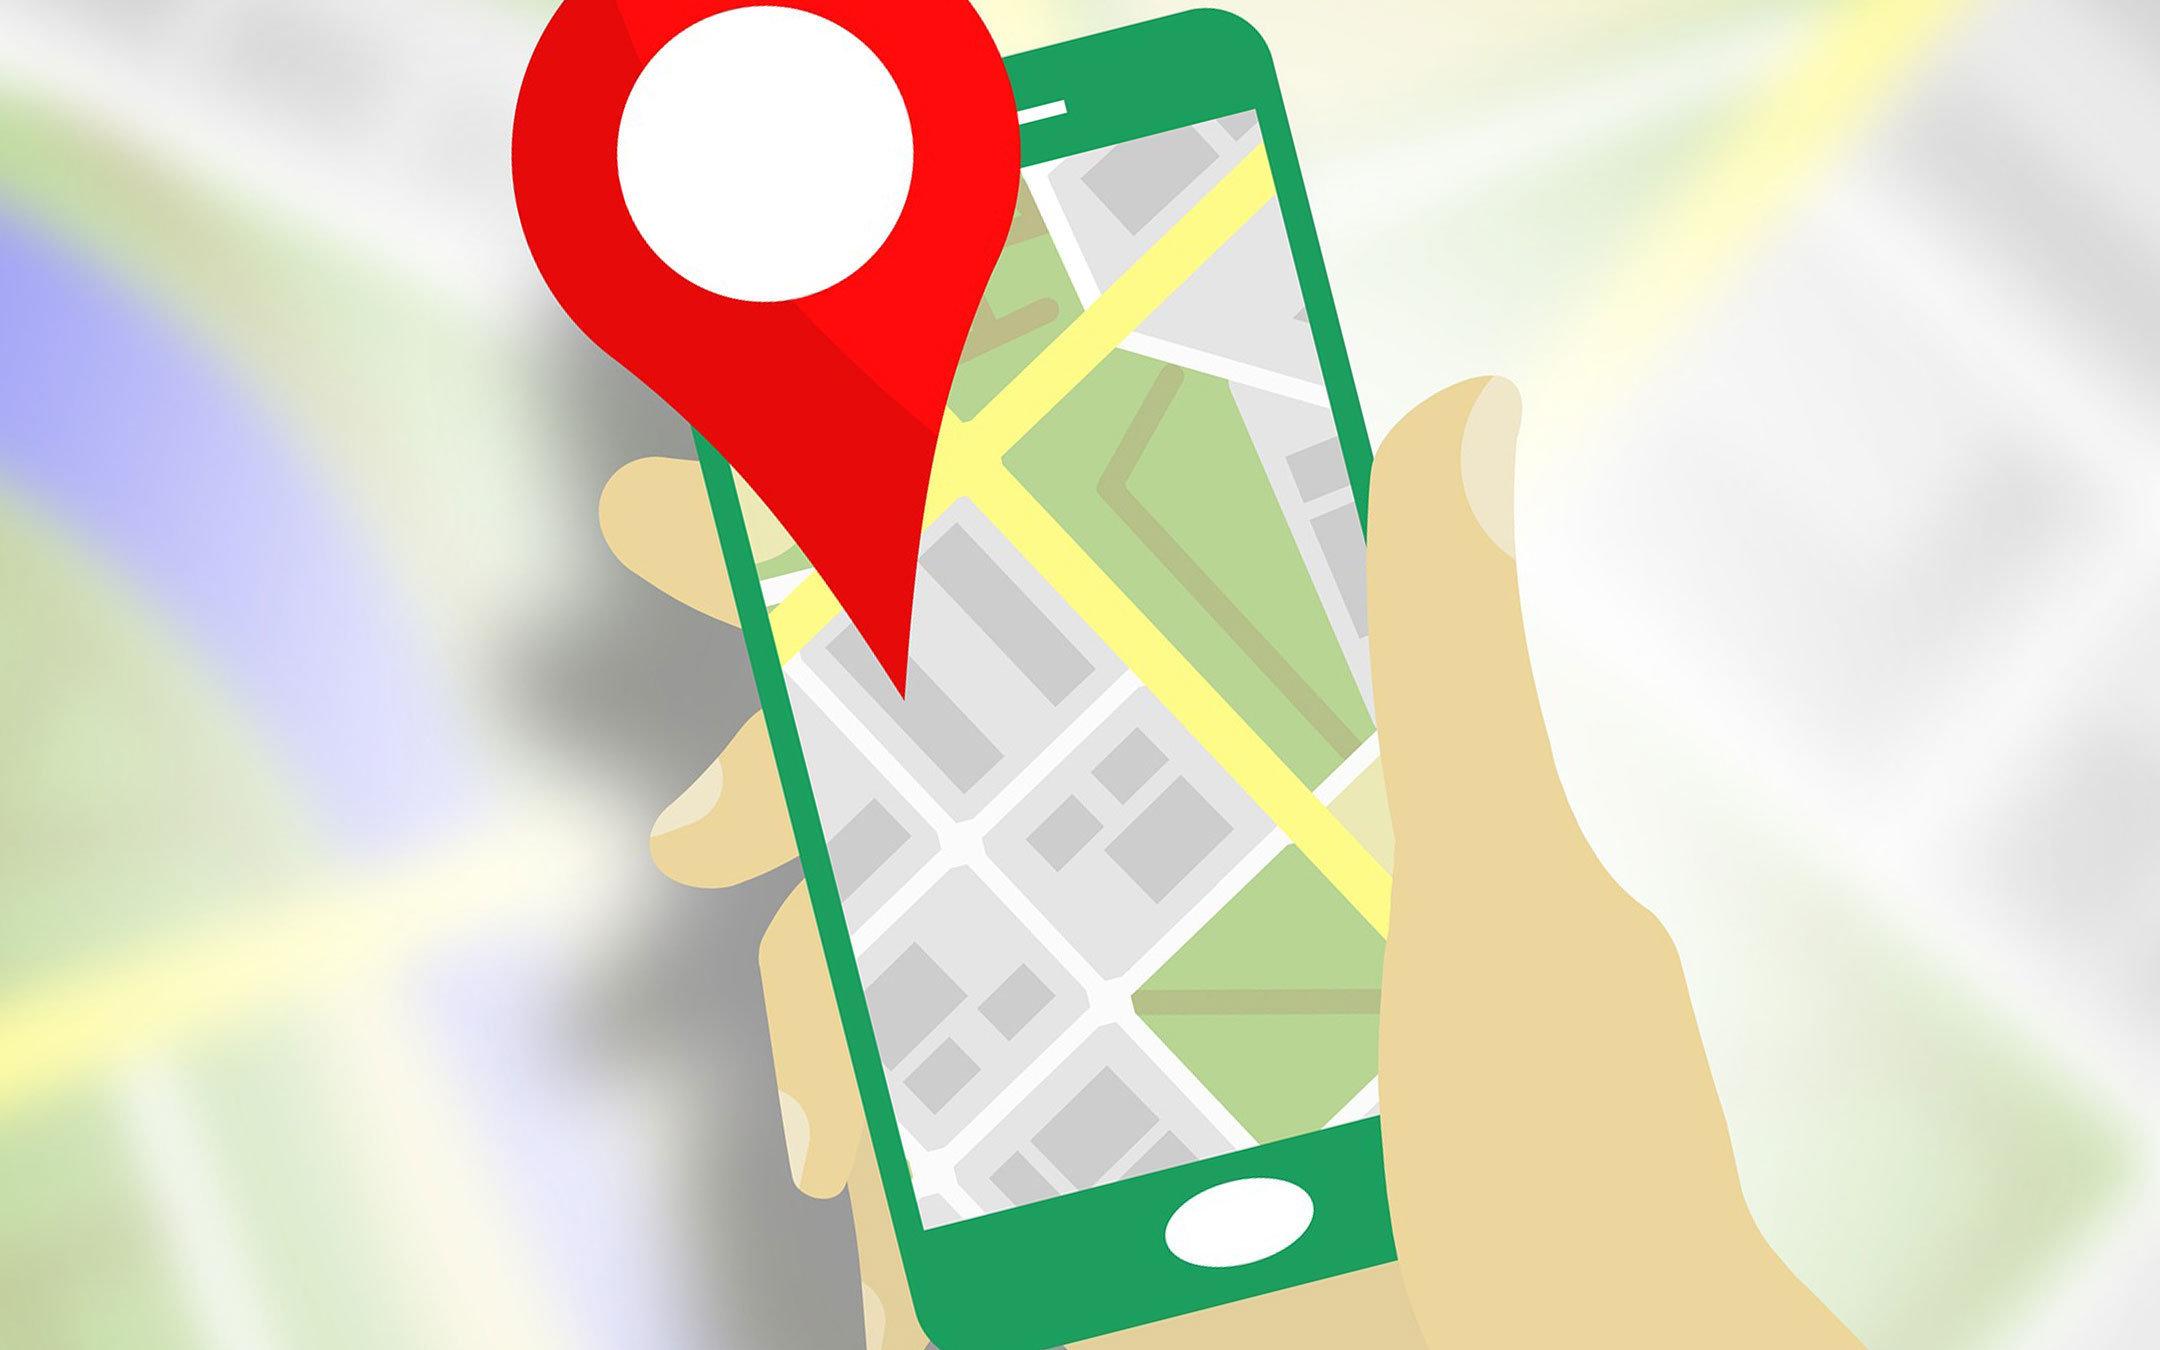 Francese dating app è stata recentemente lanciata in India